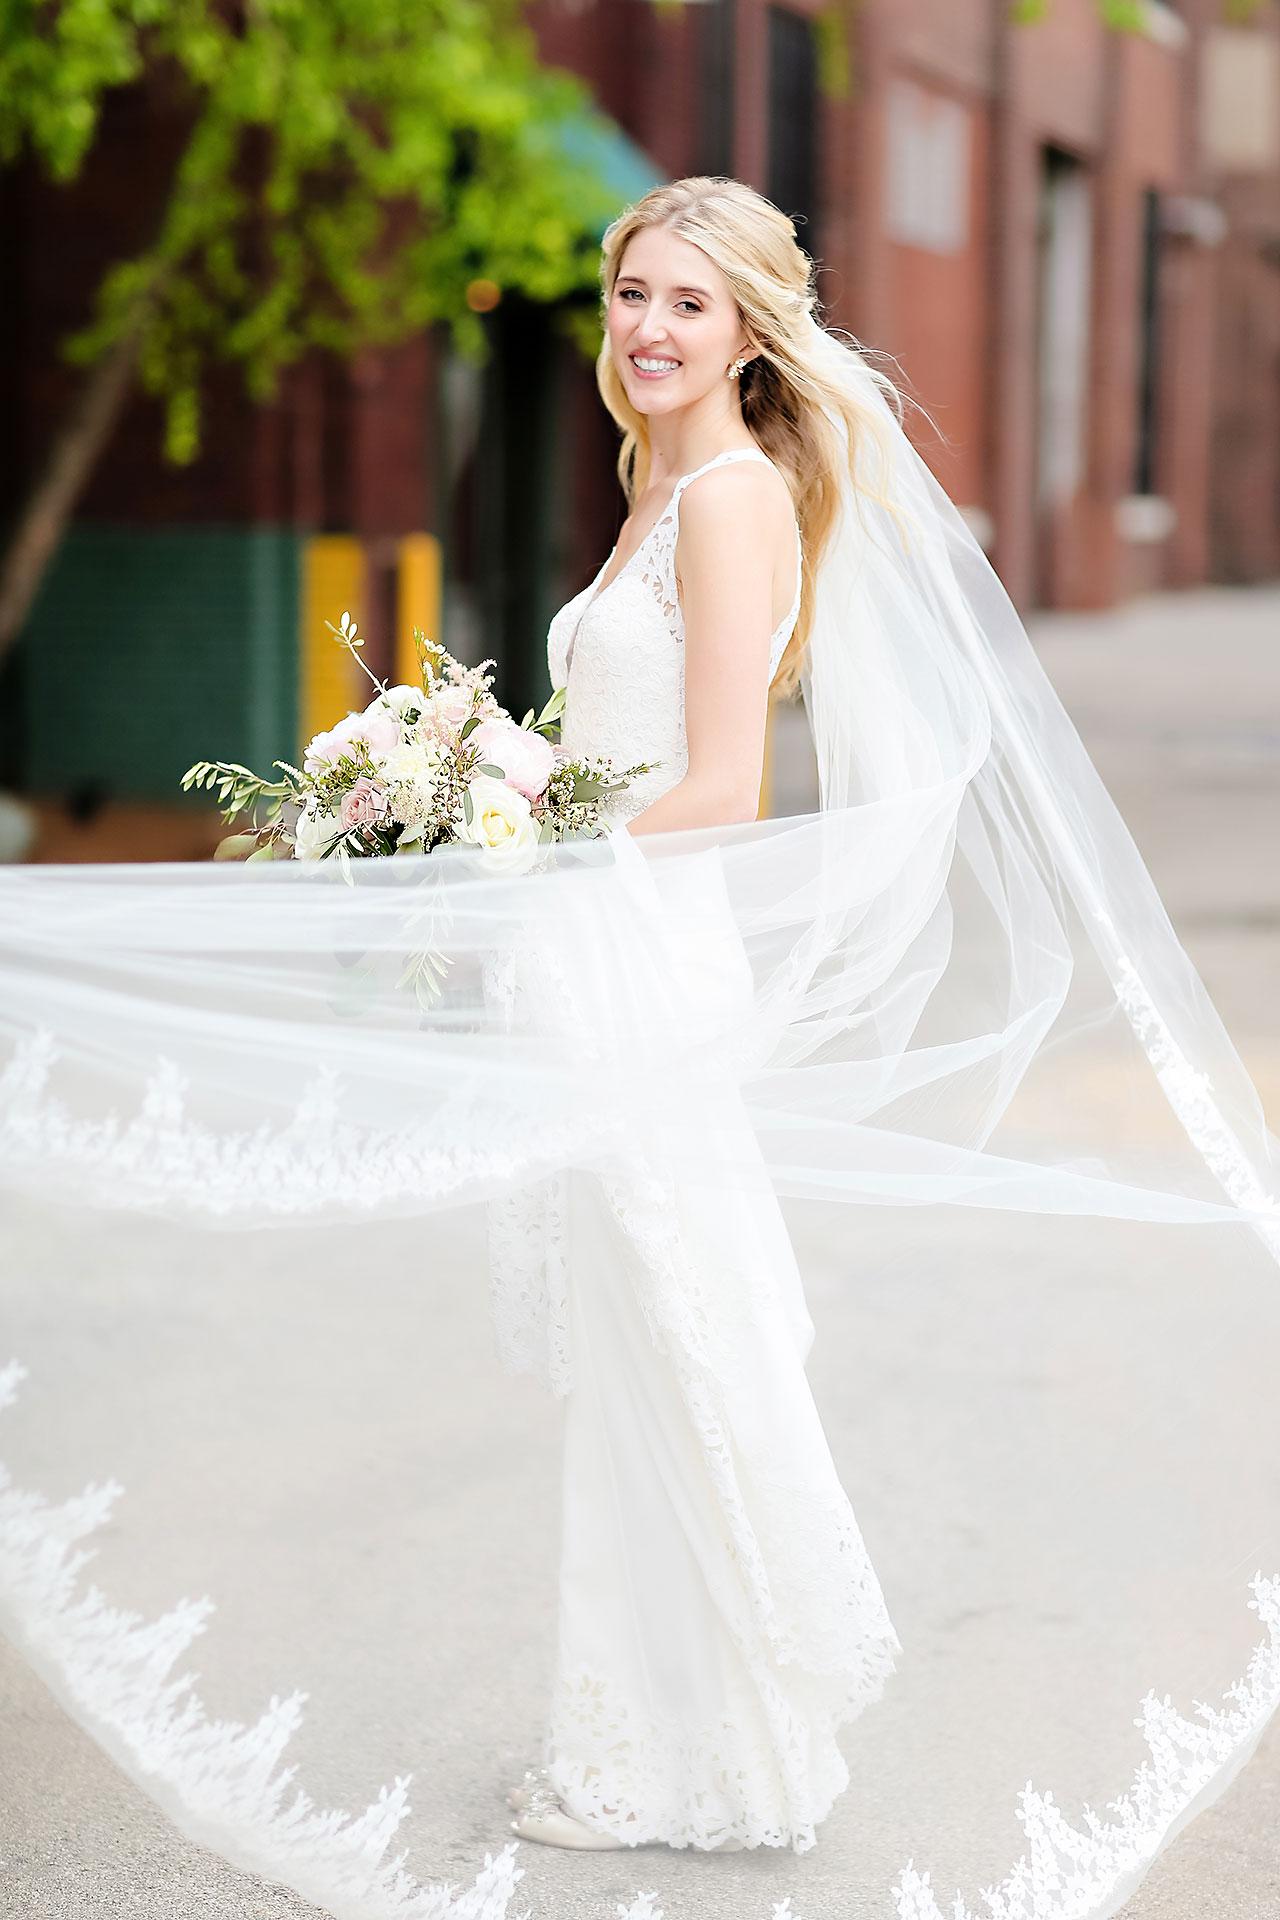 Allison Jeff Union Station Crowne Plaza Indianapolis wedding 148